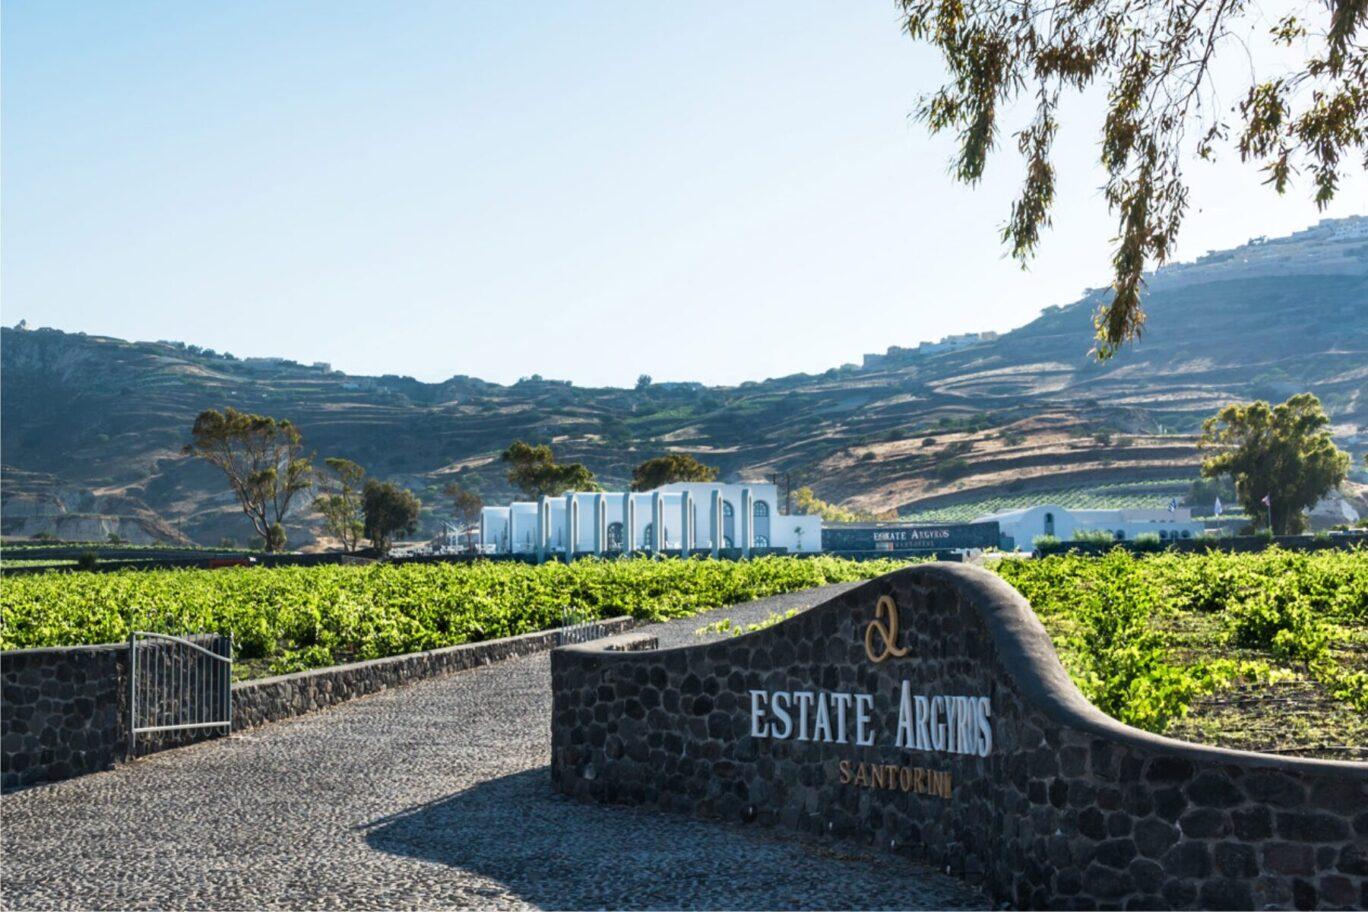 argyros winery